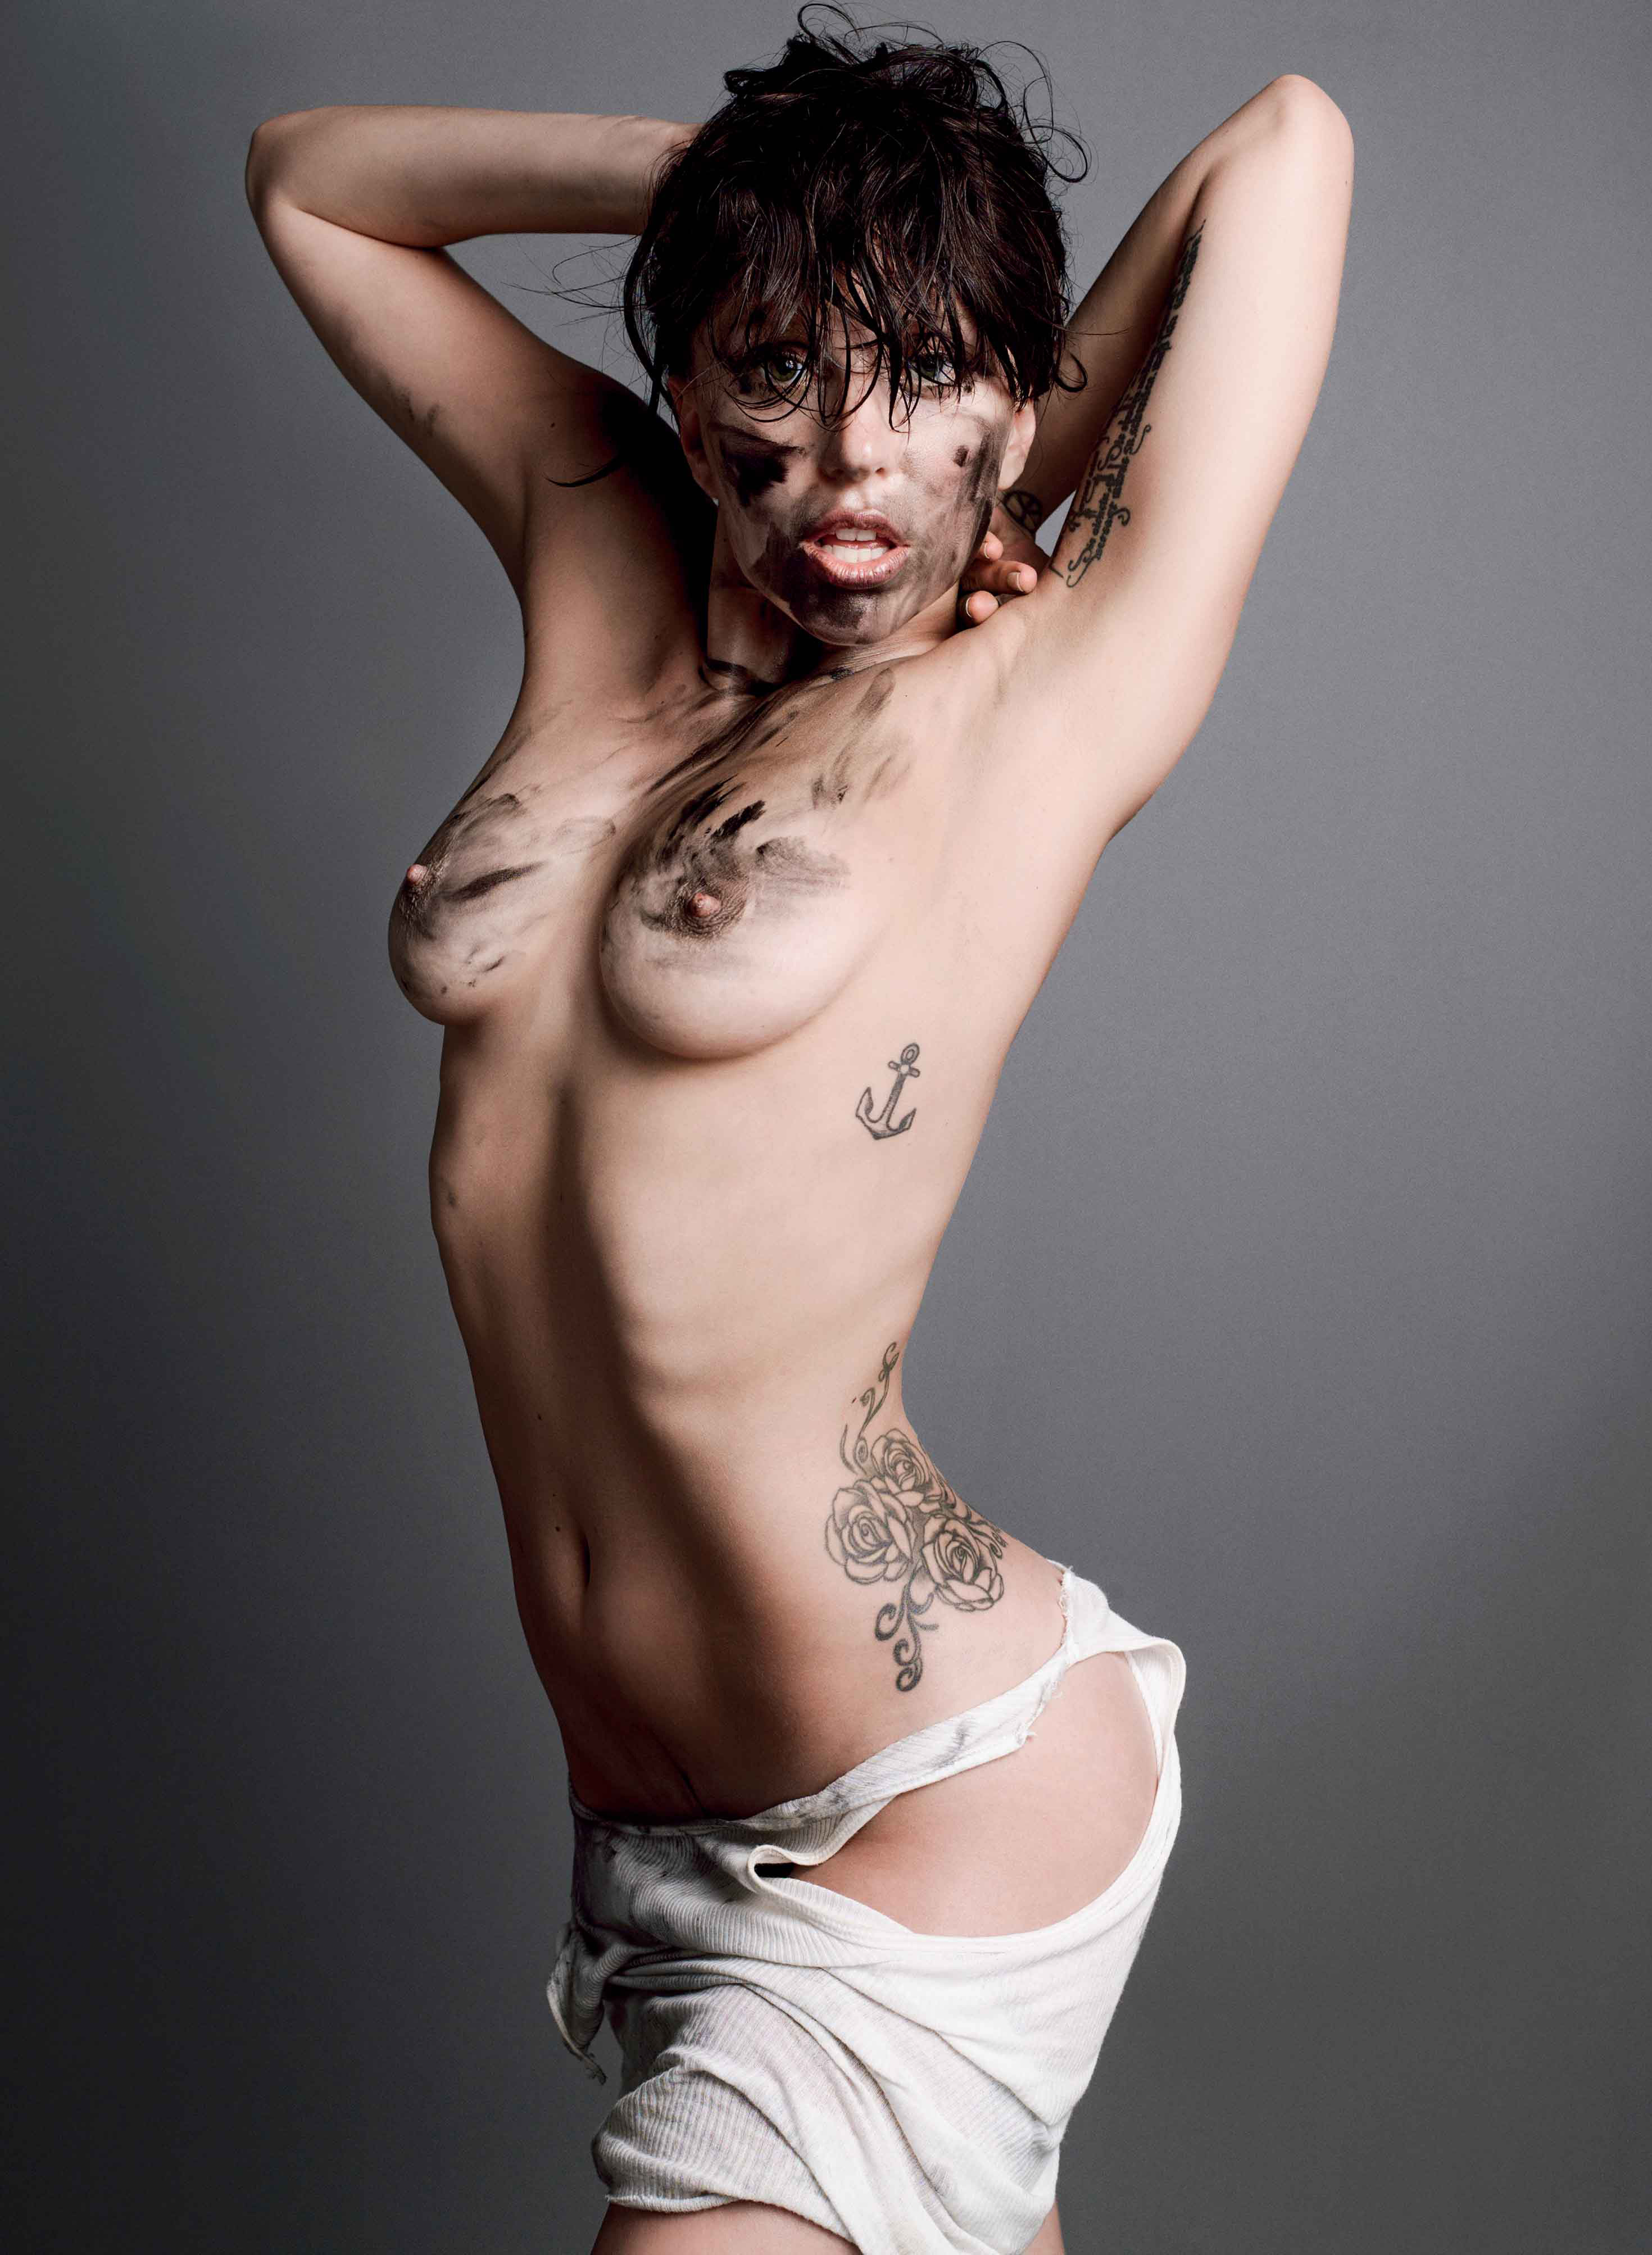 Гага леди фото голая